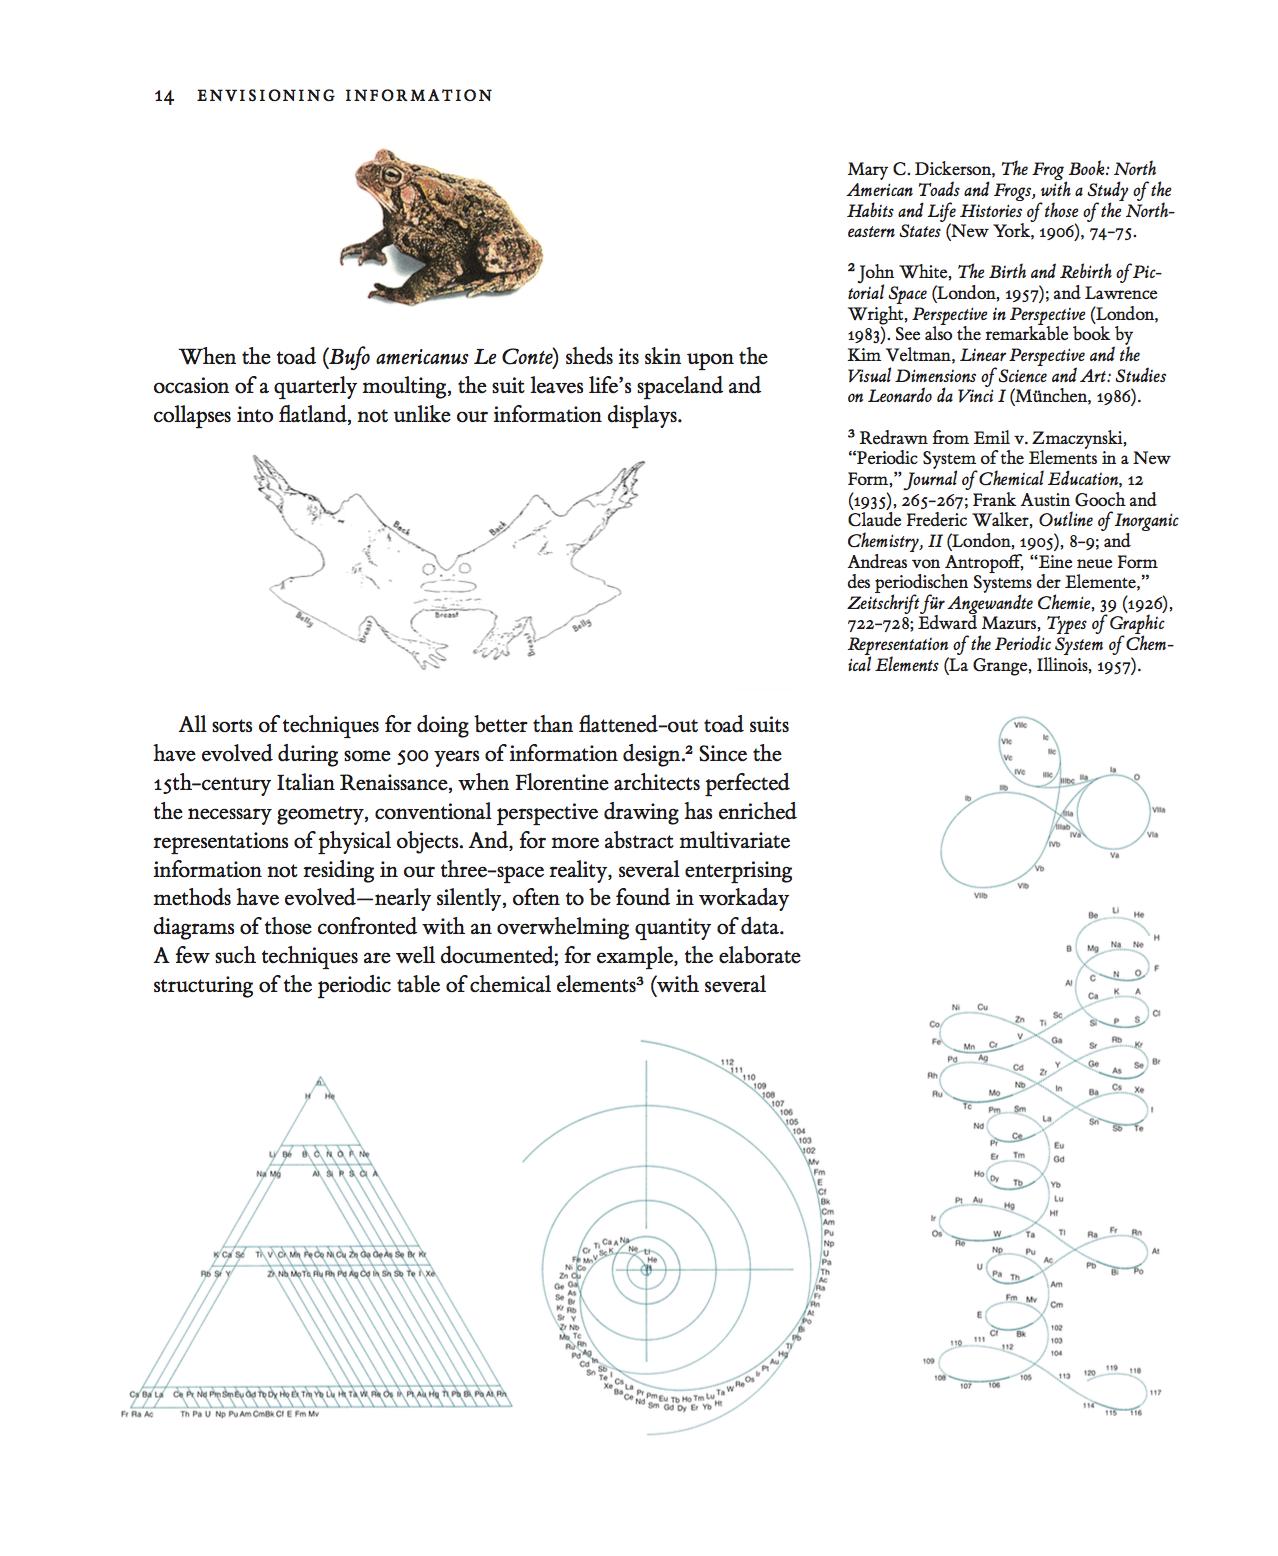 Envisioning Information, p. 14